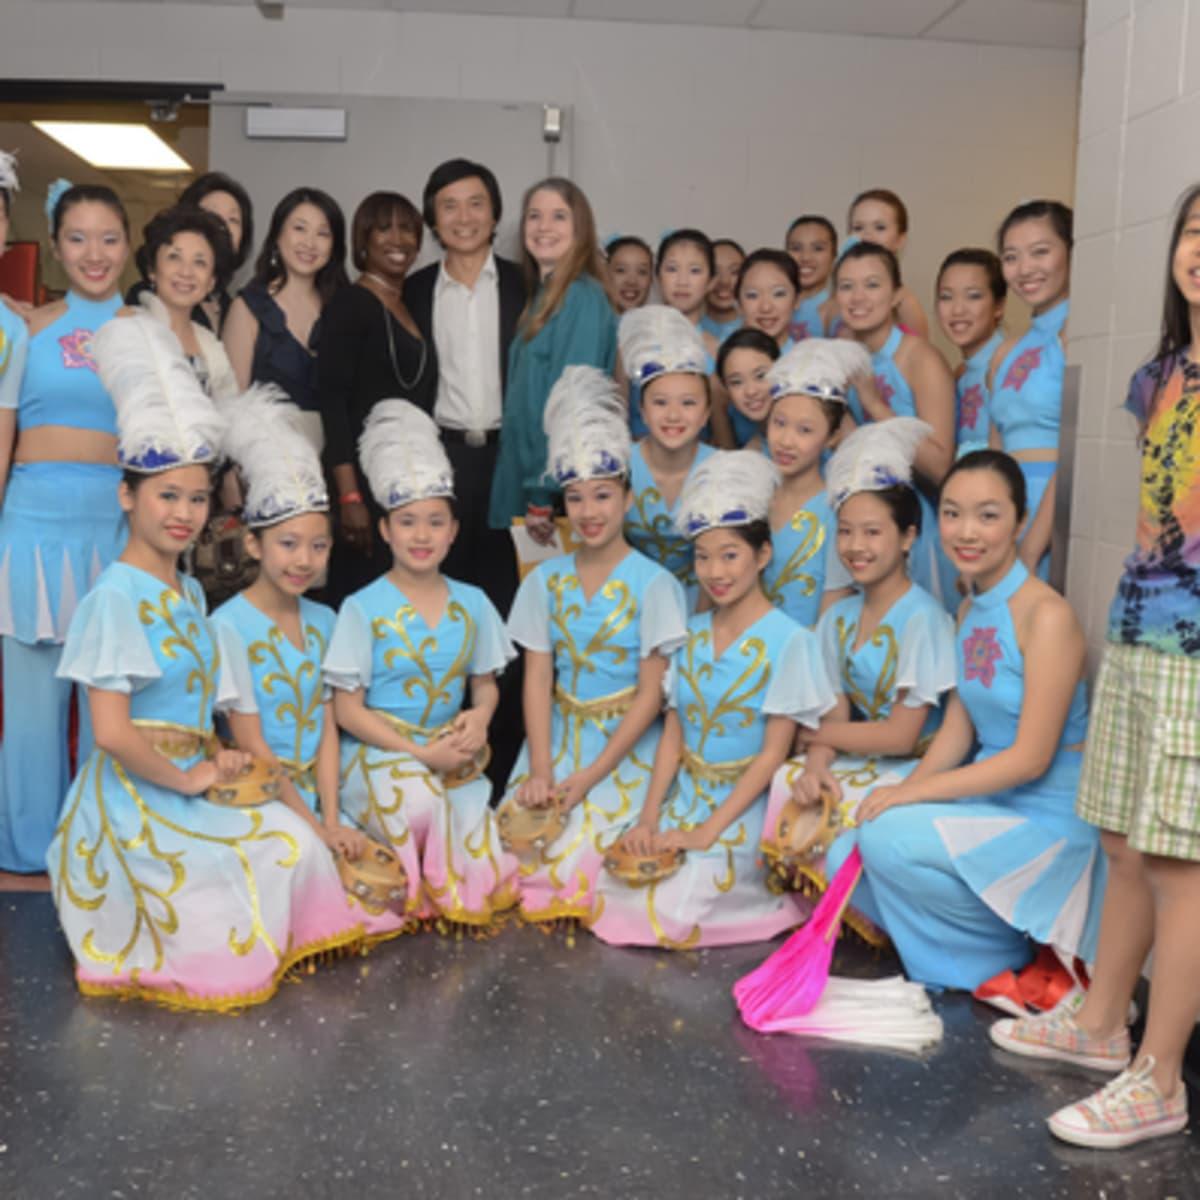 News_Li Cunxin_Dance of Asia troupe_April 2011